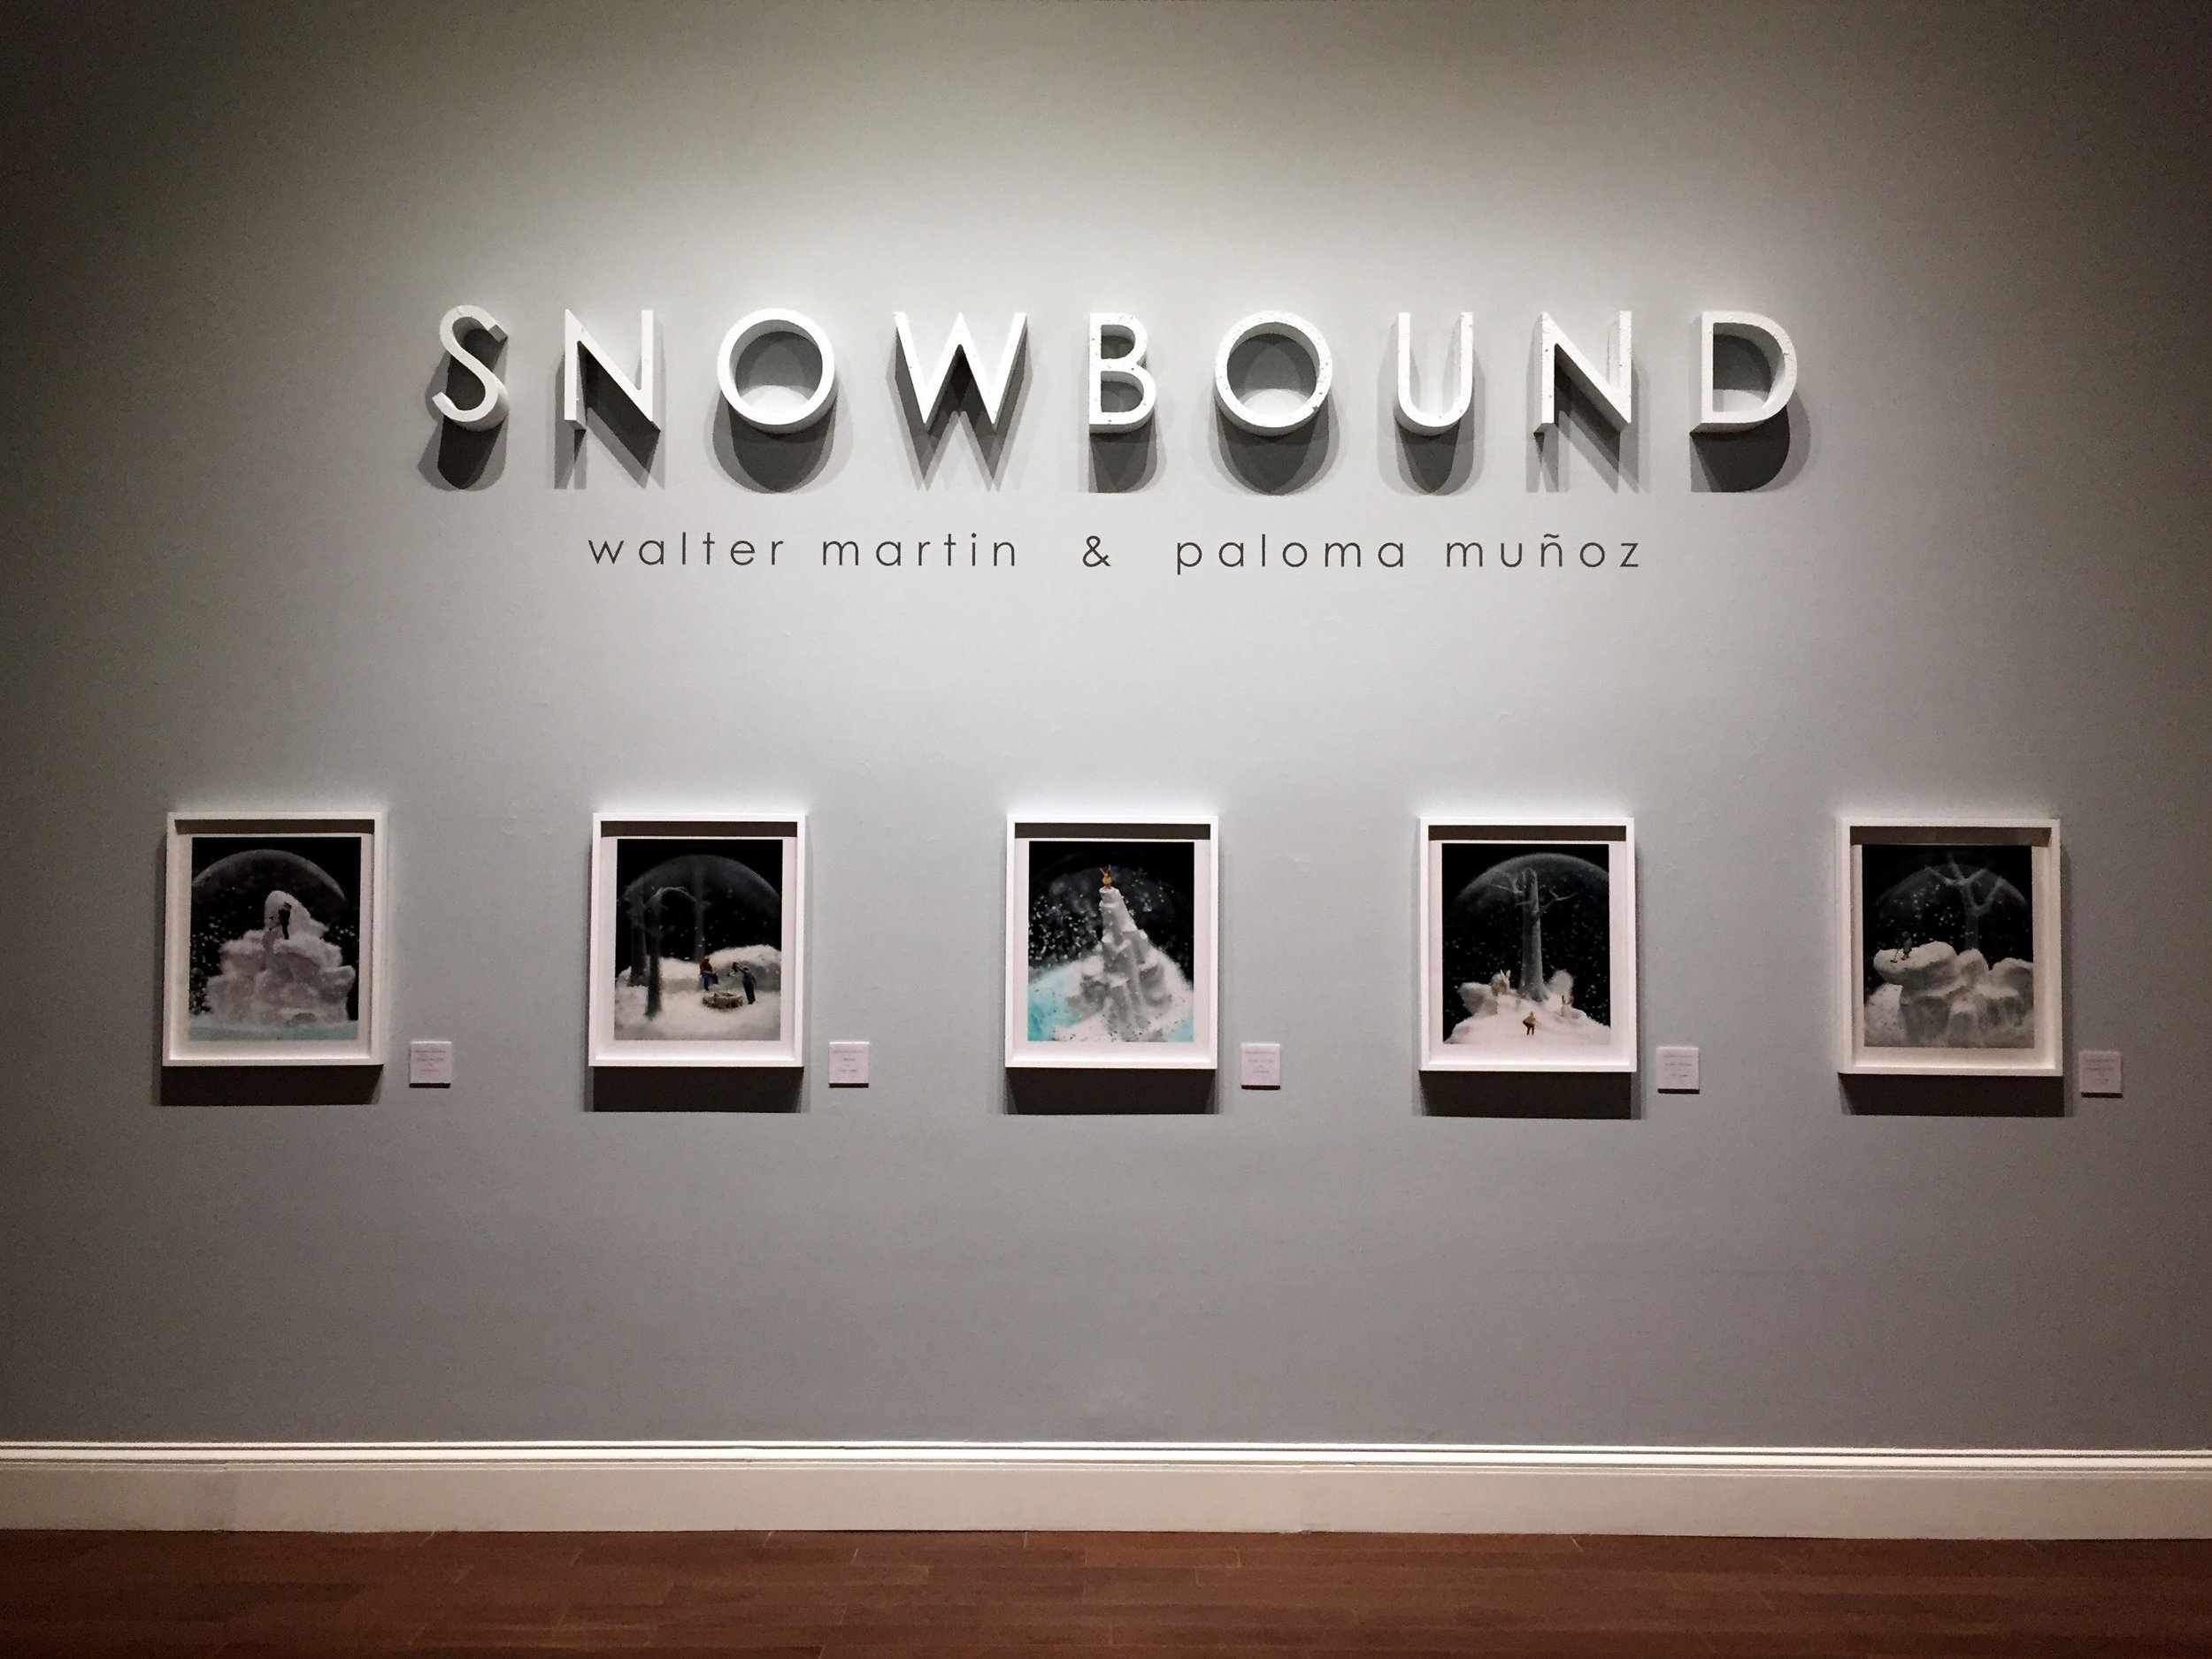 Snowbound by Walter Martin & Paloma Muñoz Cheekwood Museum of Art, Nashville, Tennessee.